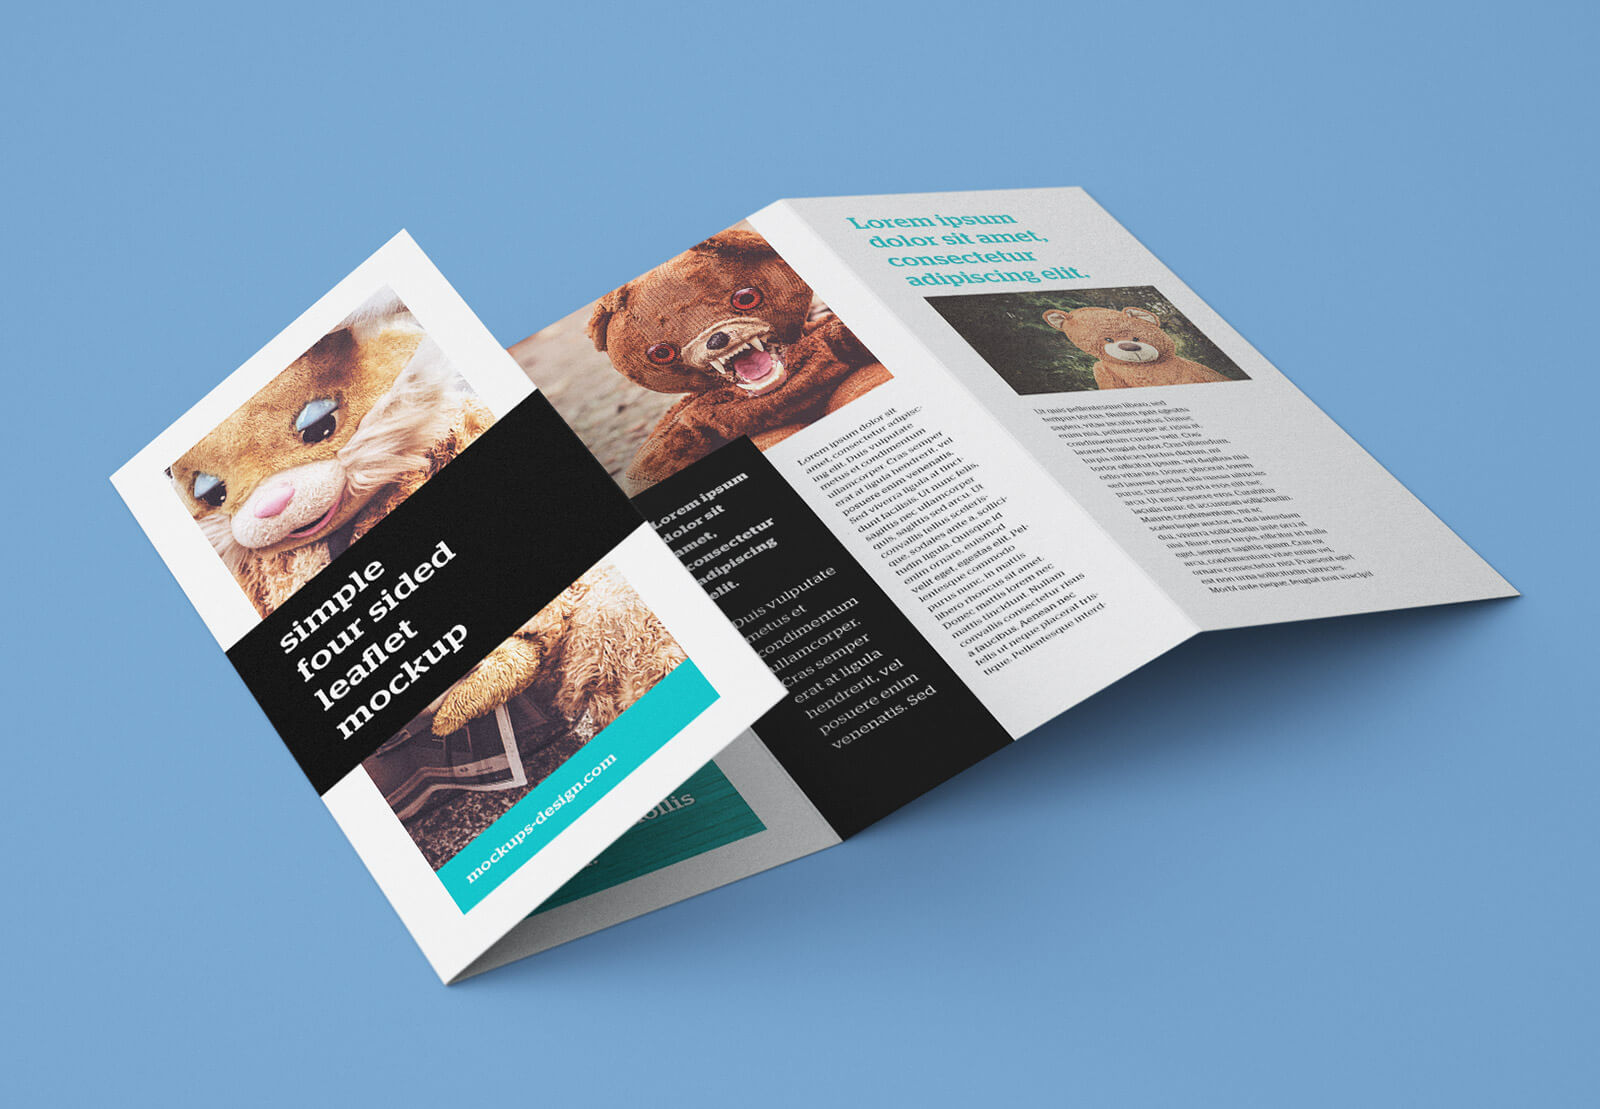 Free Accordion 4-Fold Brochure / Leaflet Mockup Psd within Quad Fold Brochure Template